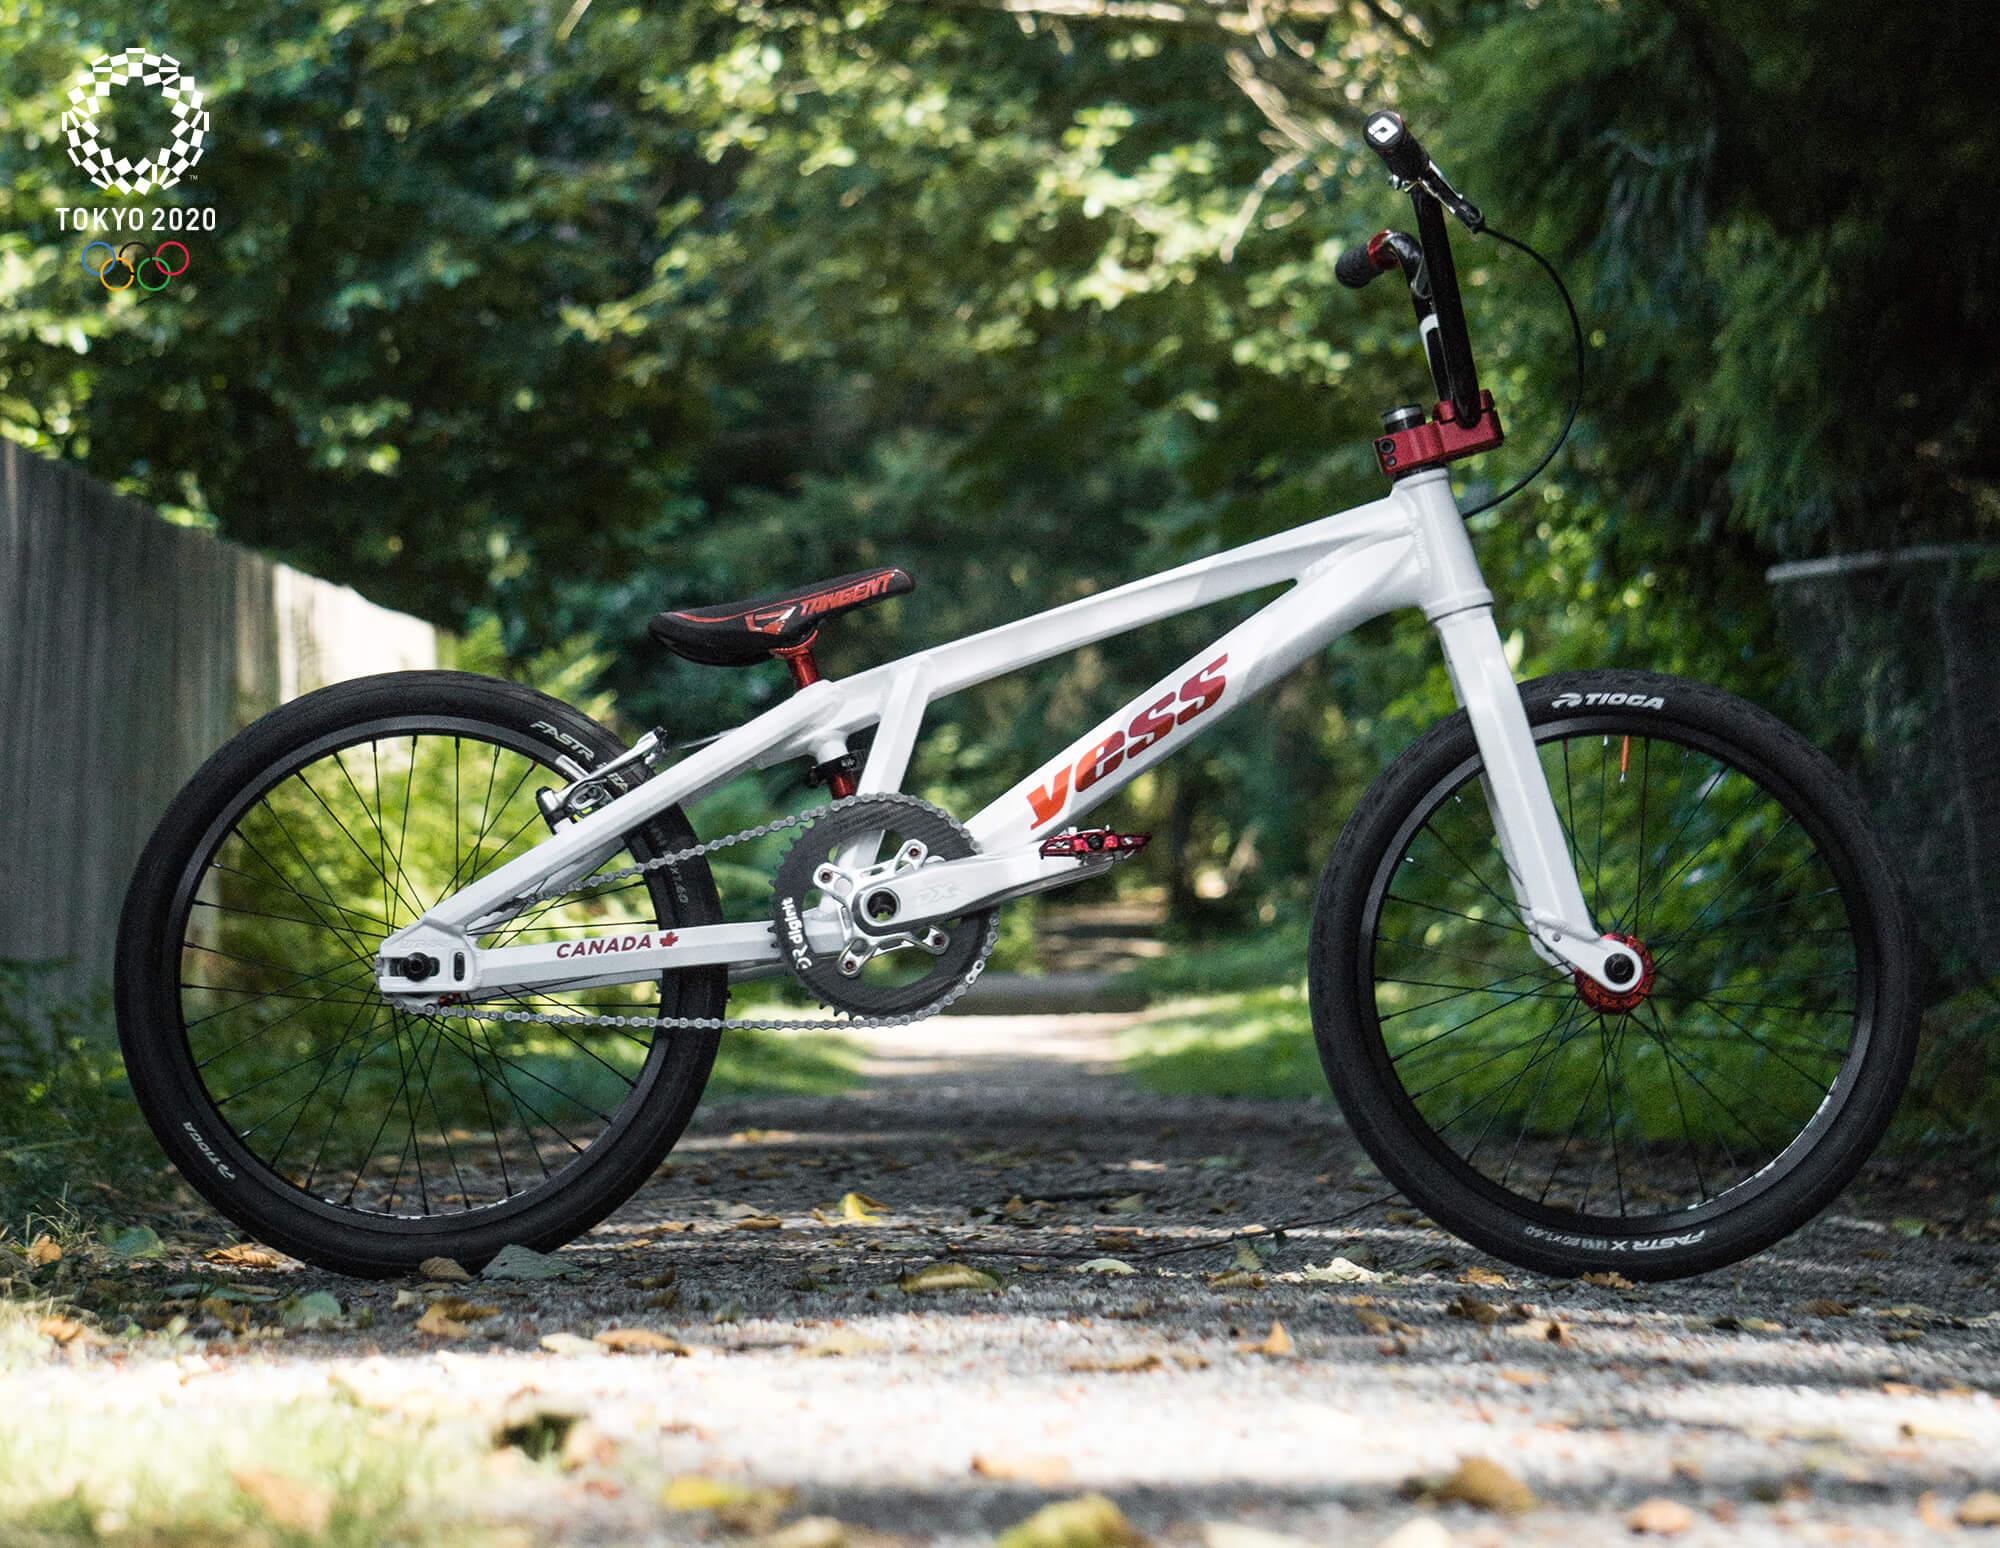 Drew Mechielsen Tokyo Olympic Bike Check 1 - Niels Bensink